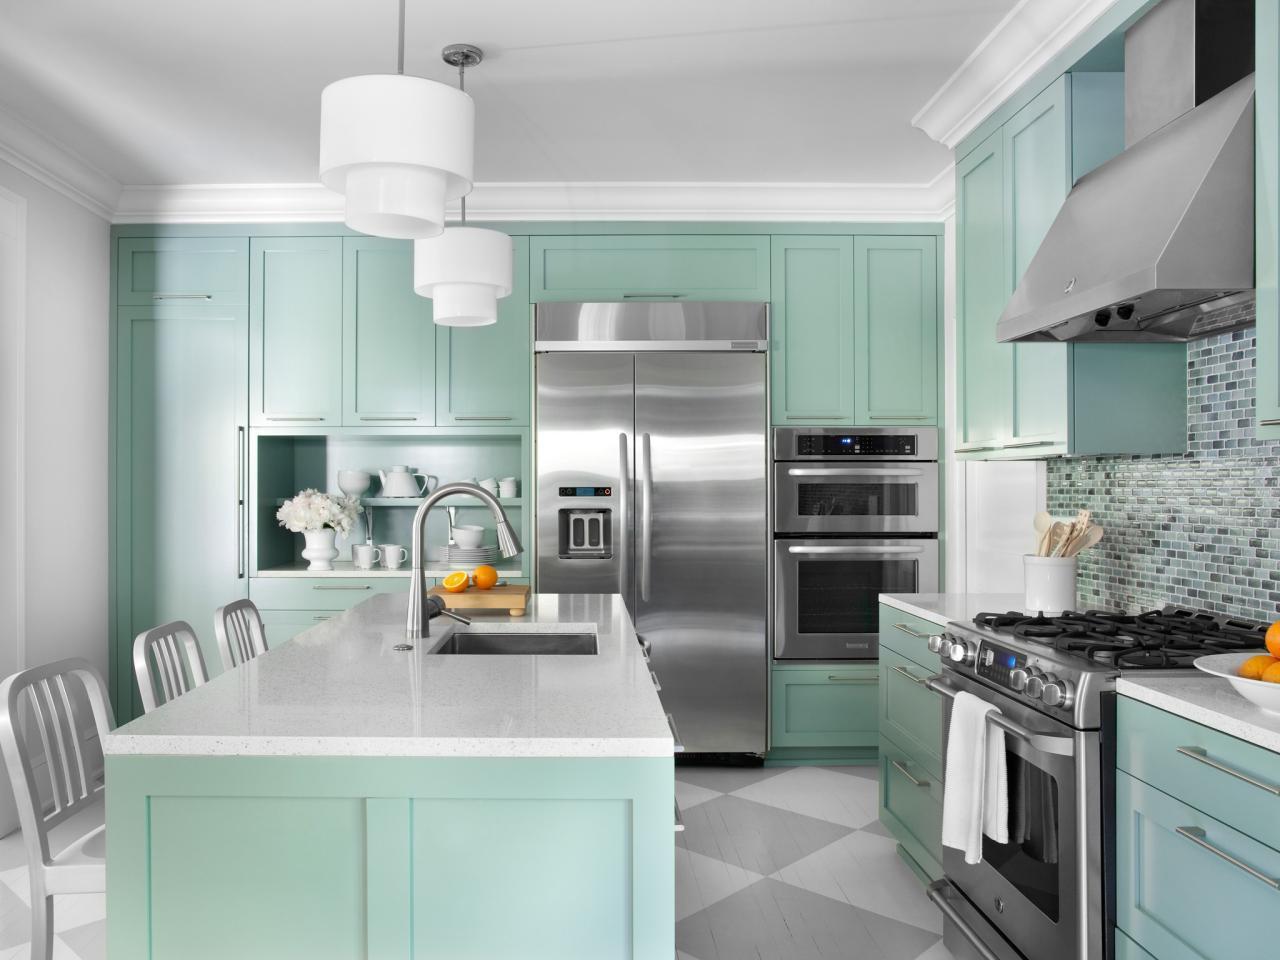 kitchen cupboard paint ideas color ideas for painting kitchen cabinets VKJPLTD